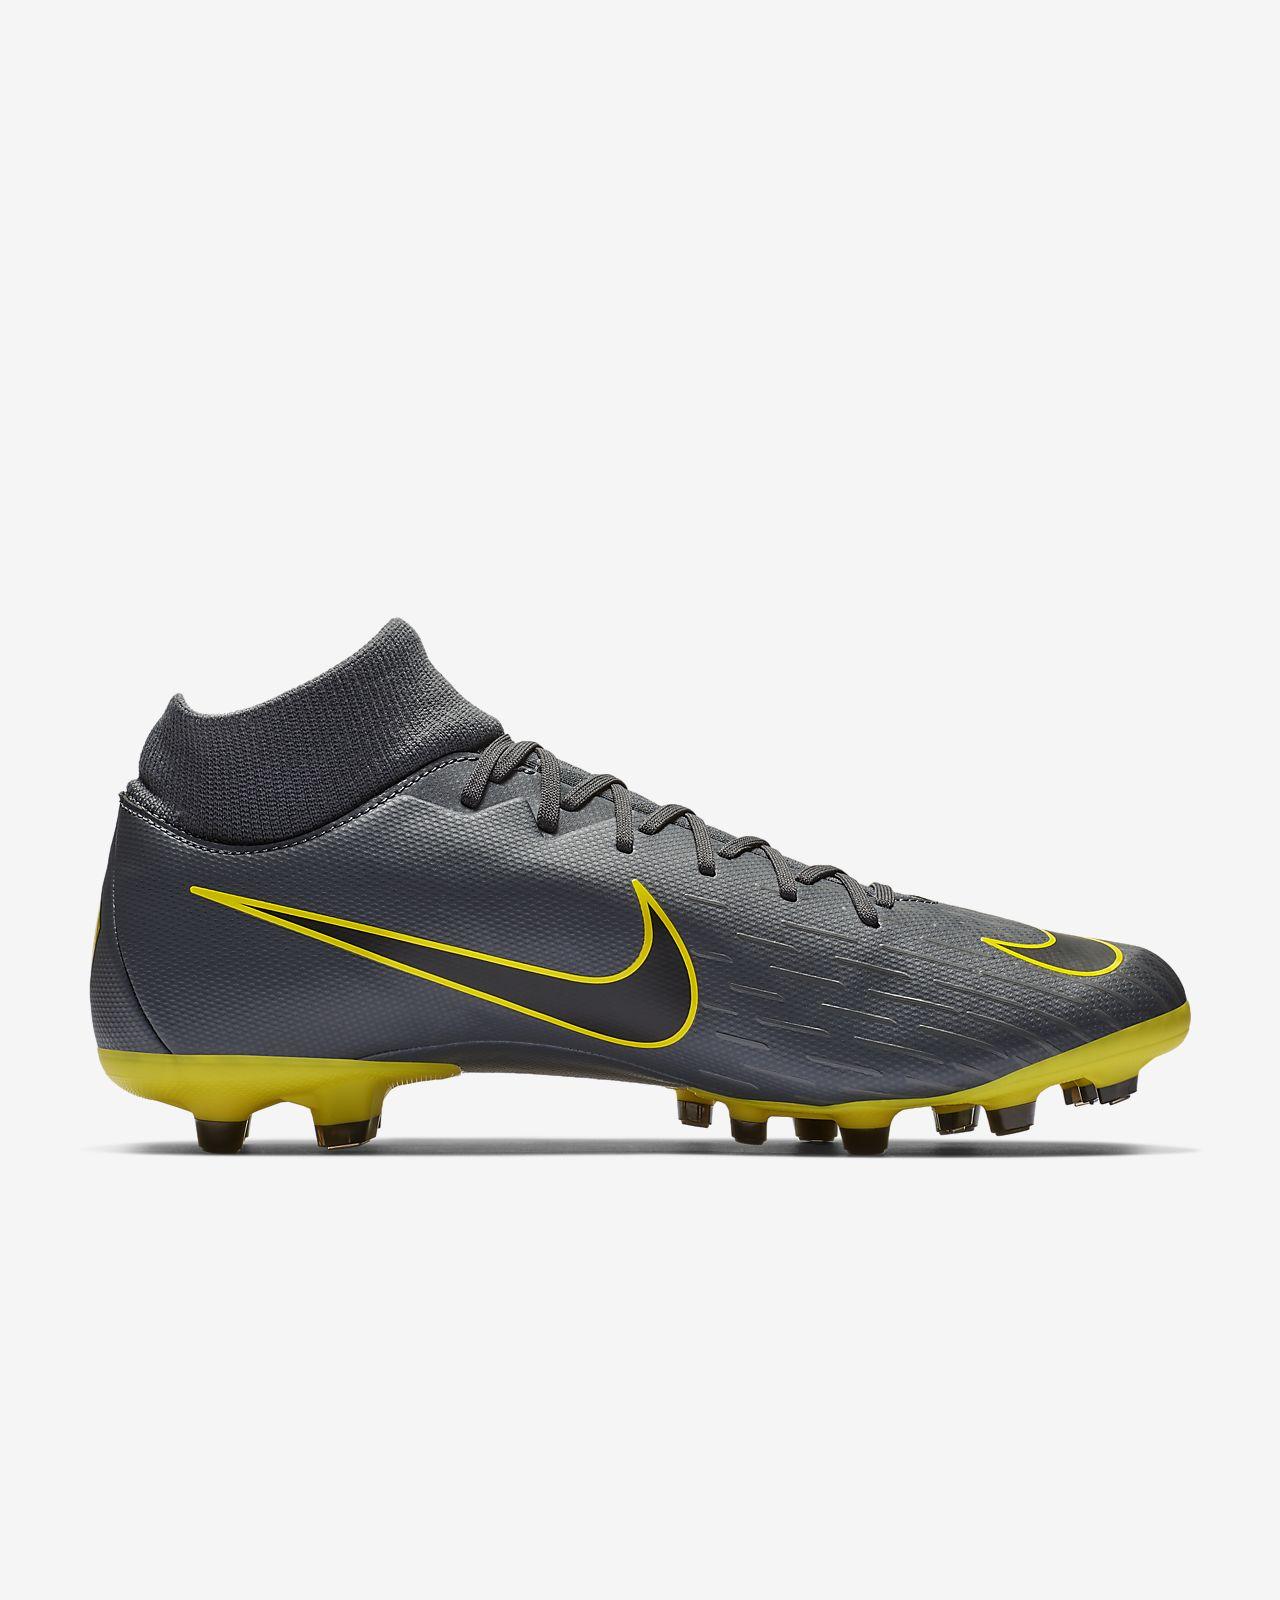 promo code eb1ca 306f7 ... Chaussure de football multi-terrains à crampons Nike Mercurial Superfly  6 Academy MG